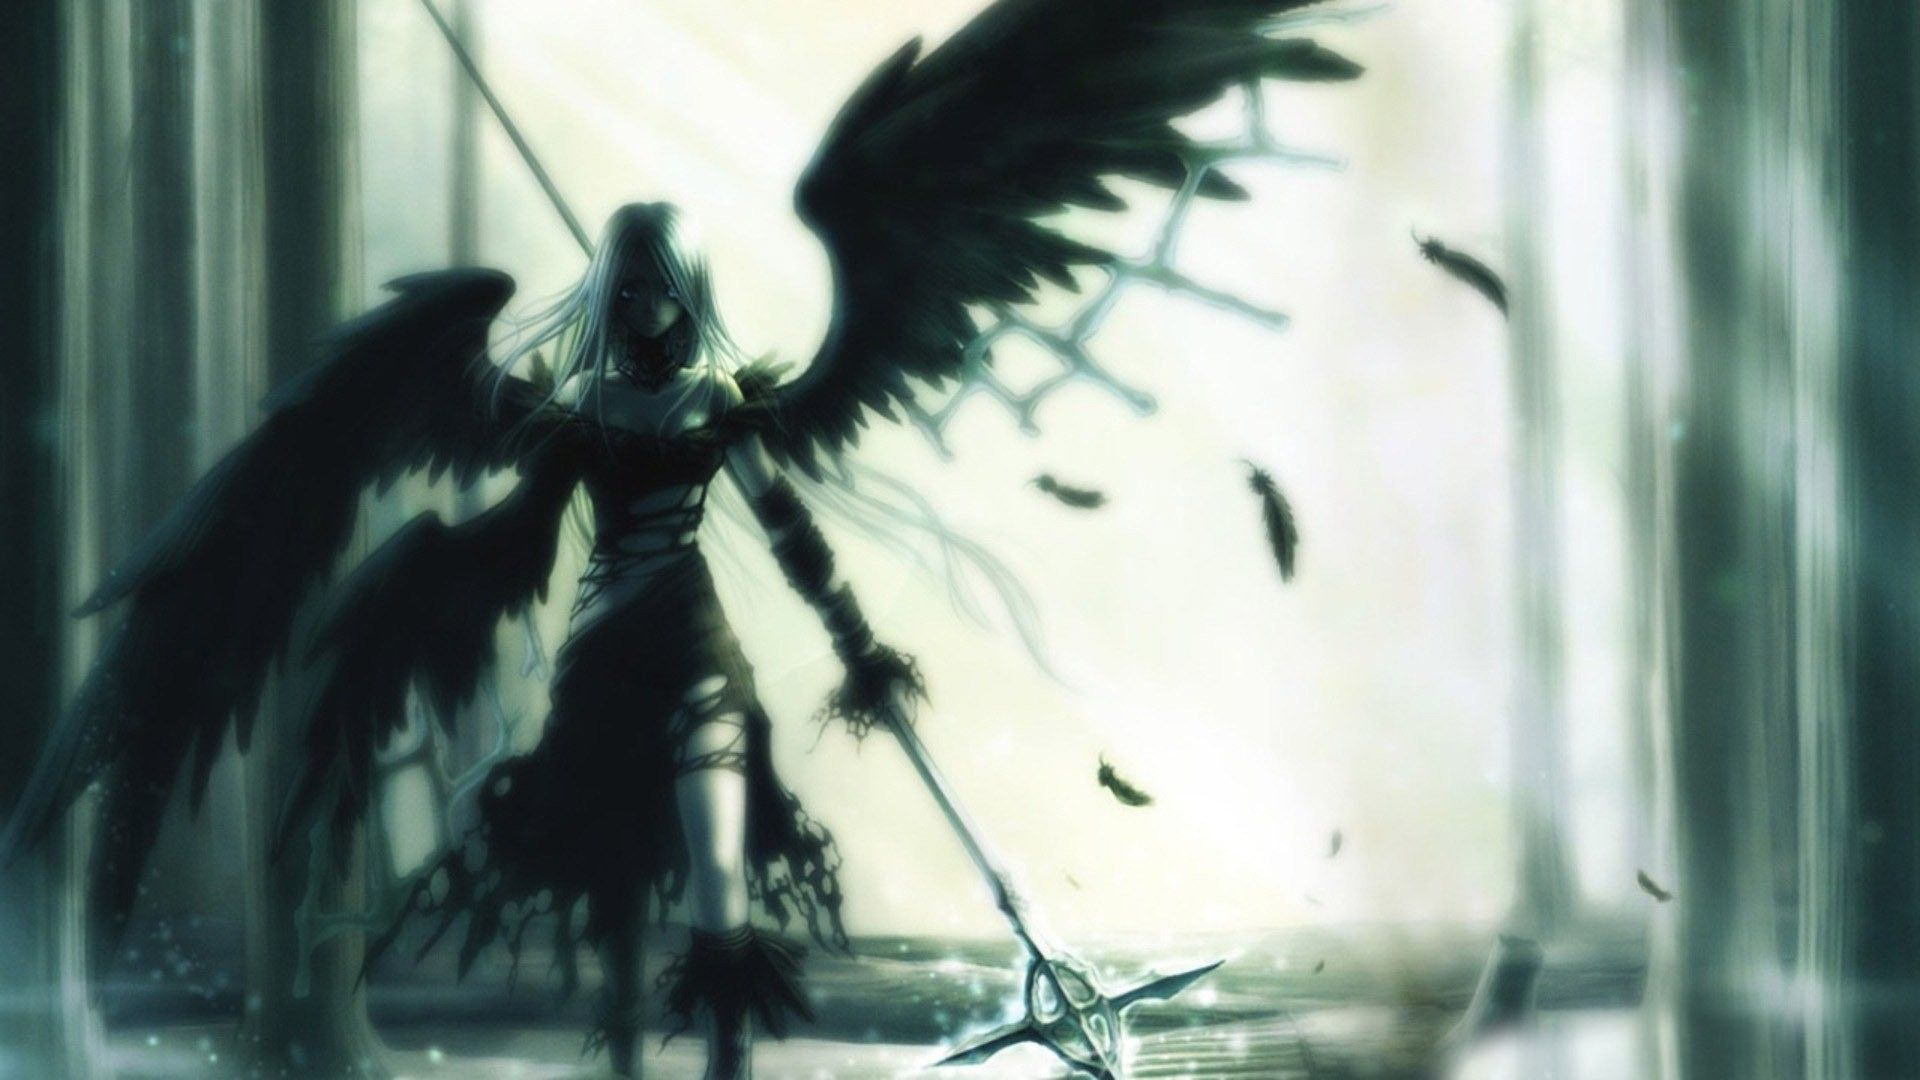 Dark angel wallpapers top free dark angel backgrounds - Dark angel anime wallpaper ...